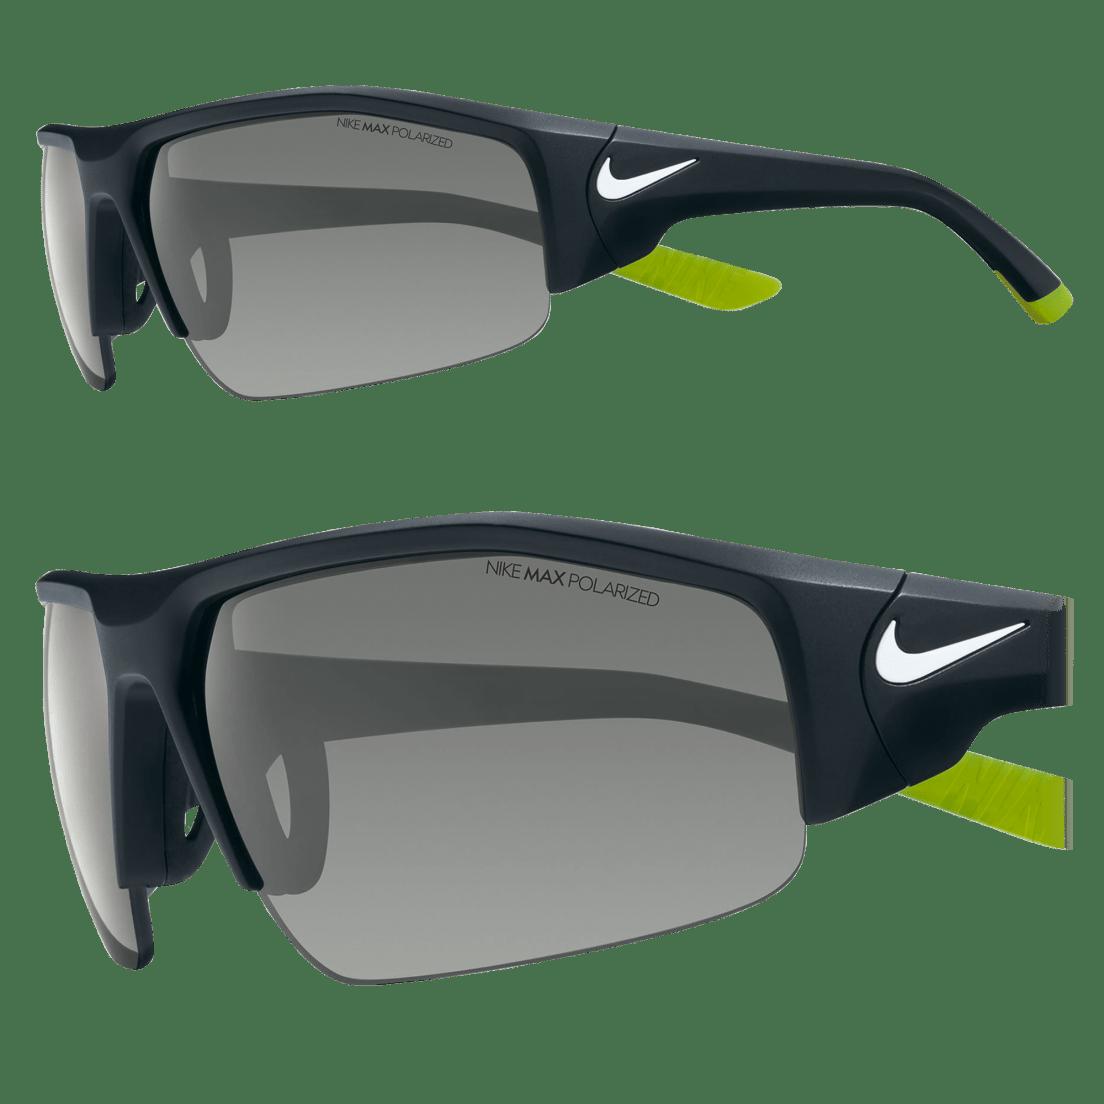 95e02f2ca523 Nike Unisex Skylon Ace XV Polarized Sunglasses